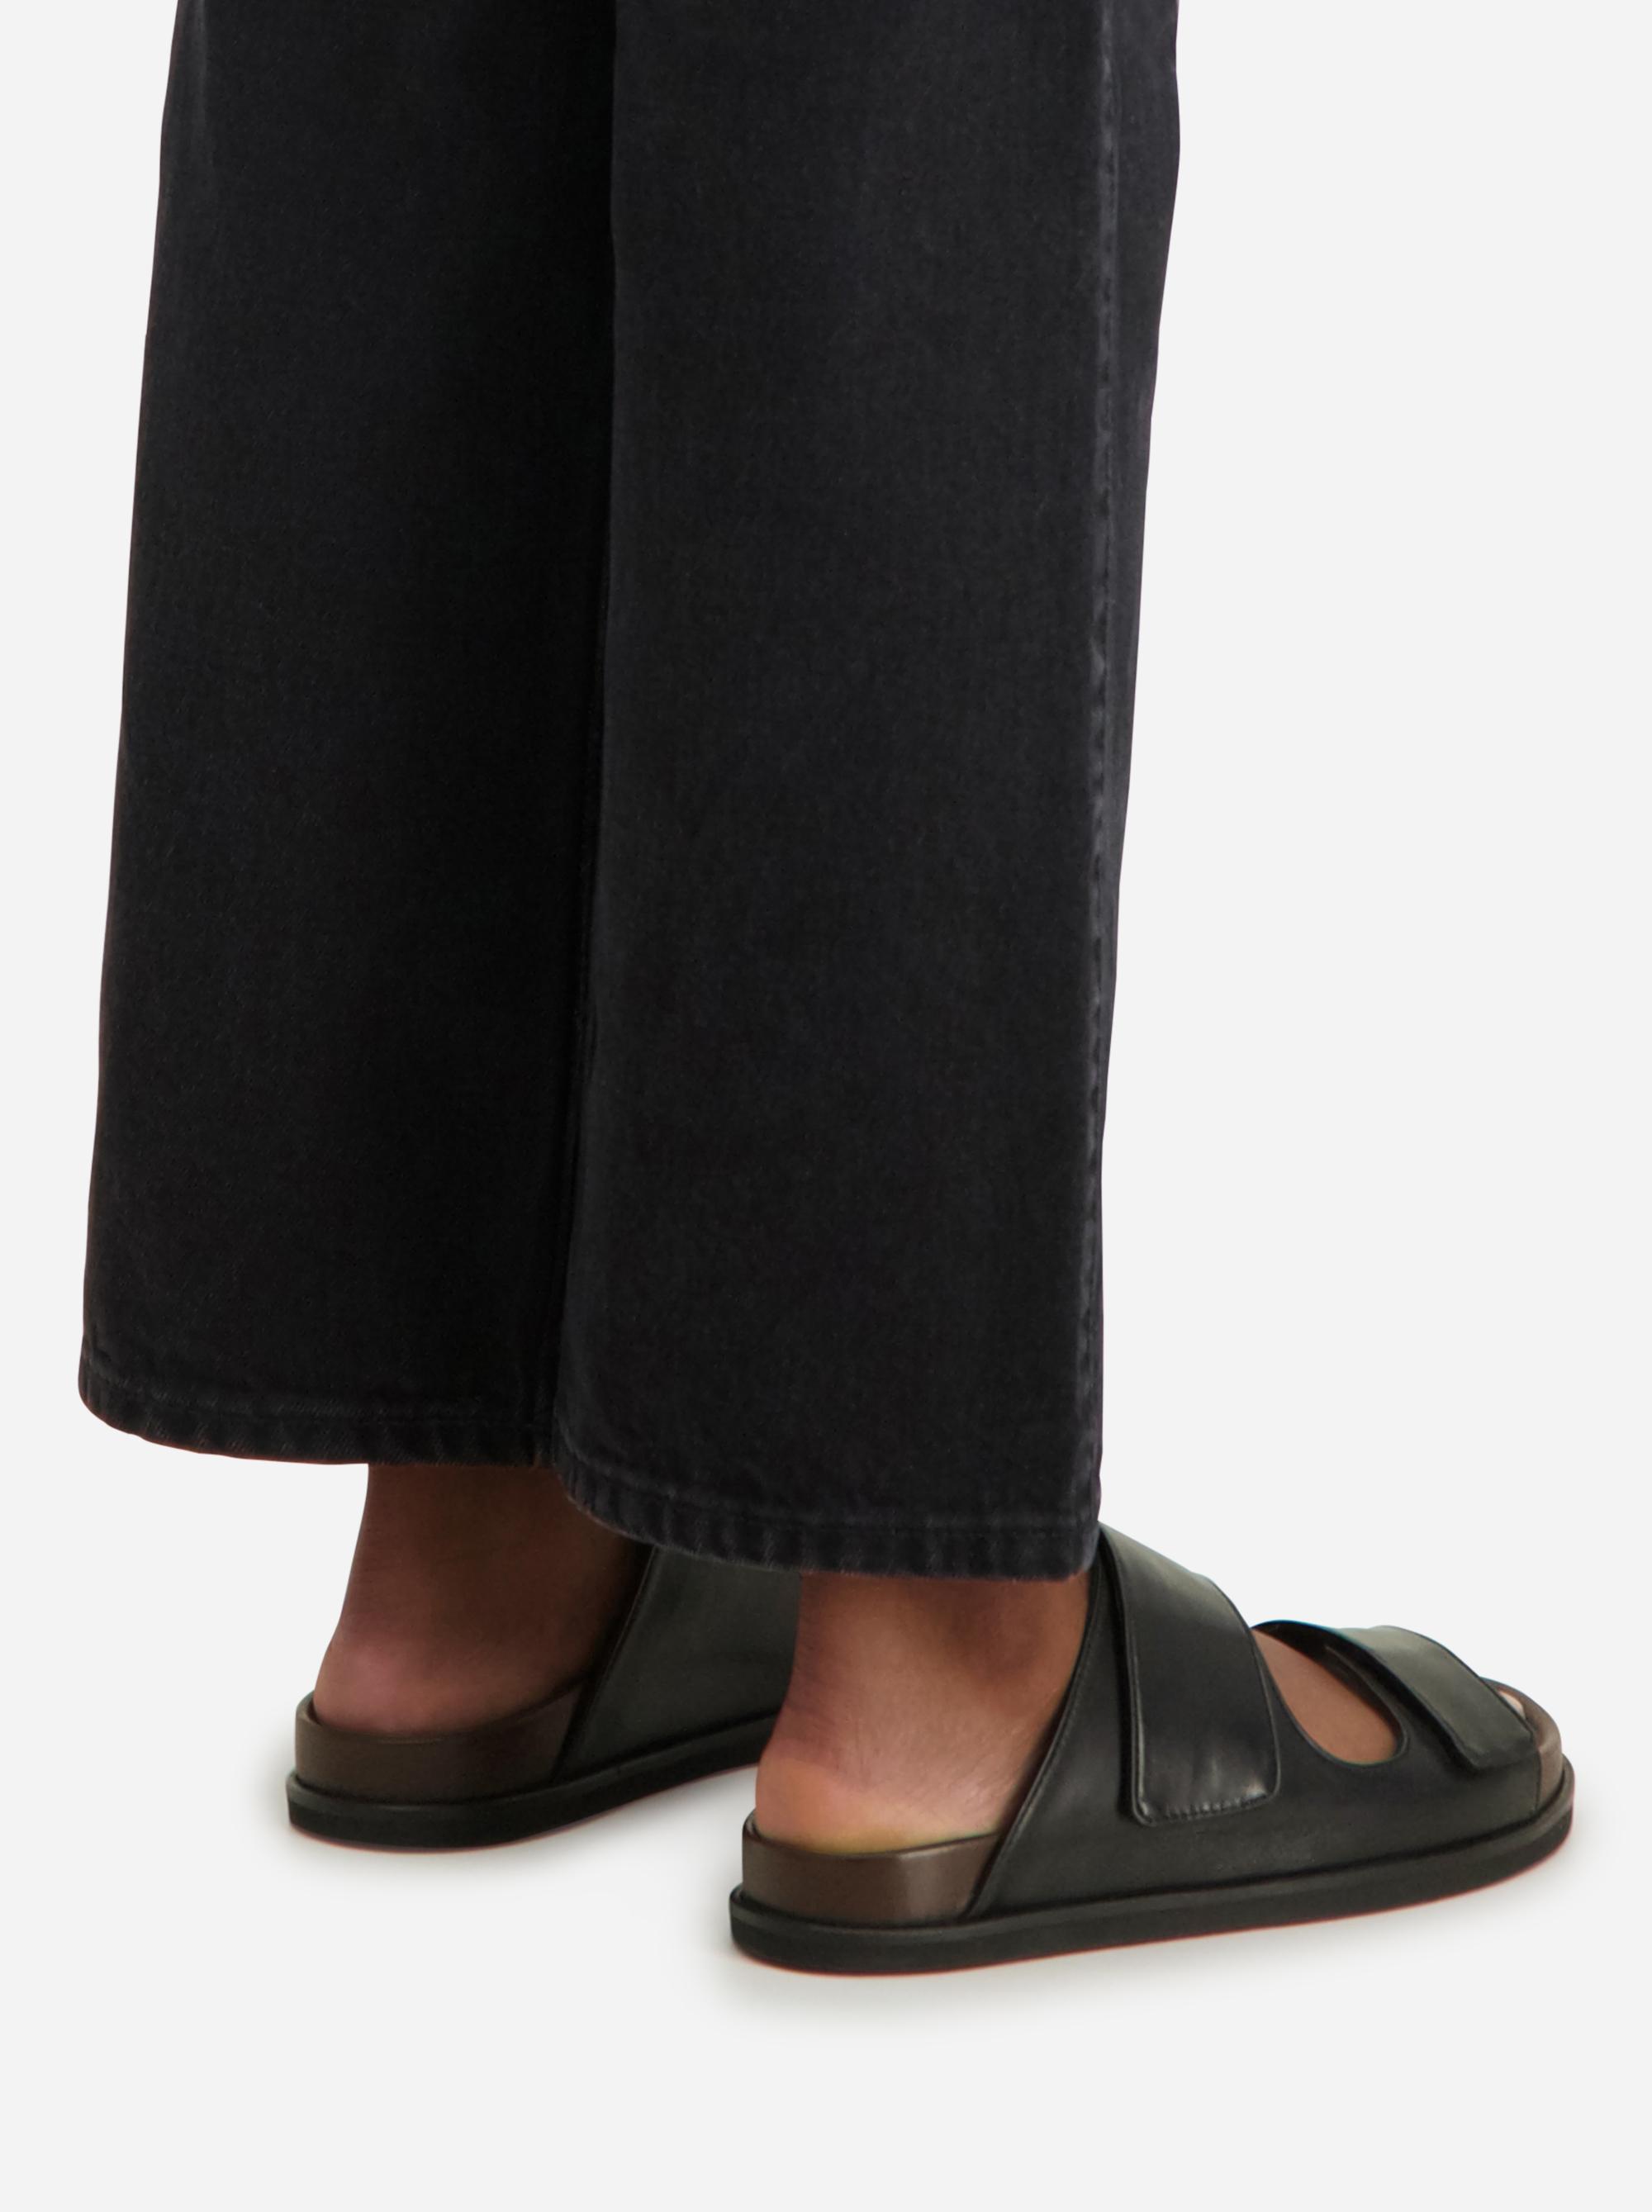 Teym - The Sandal - Women - Black - 3